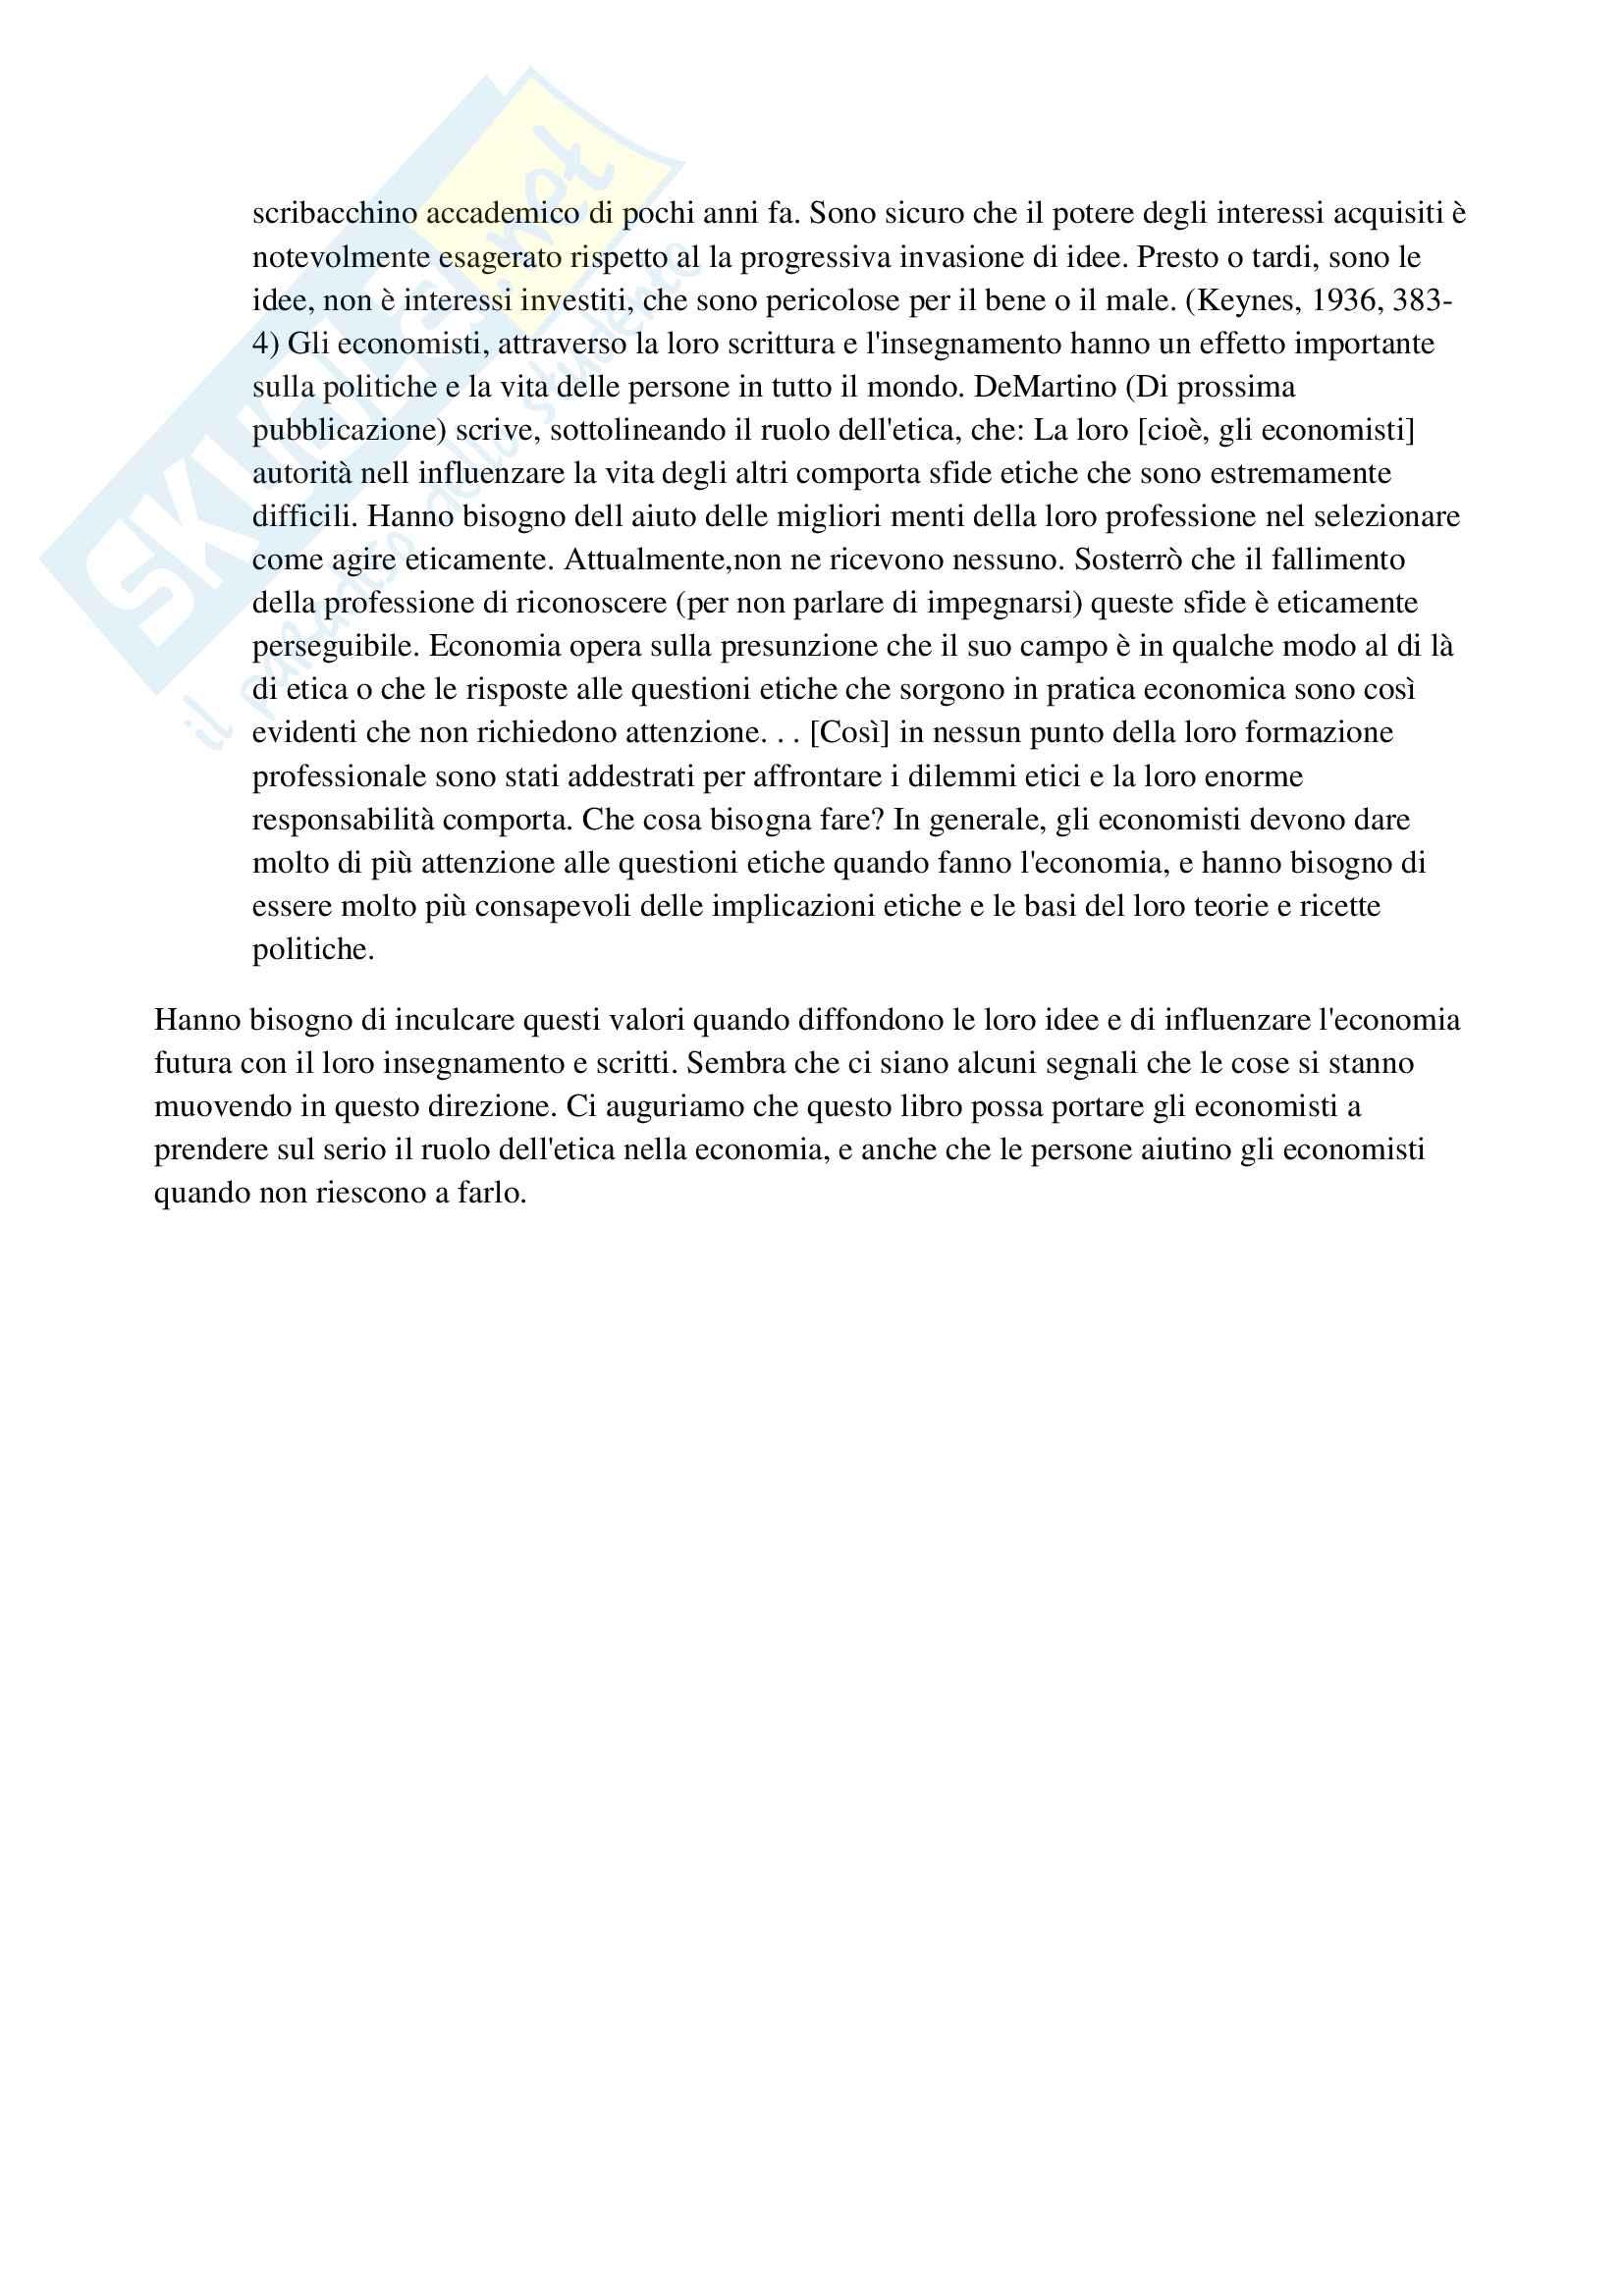 Modulo economico (De Muro) Pag. 51